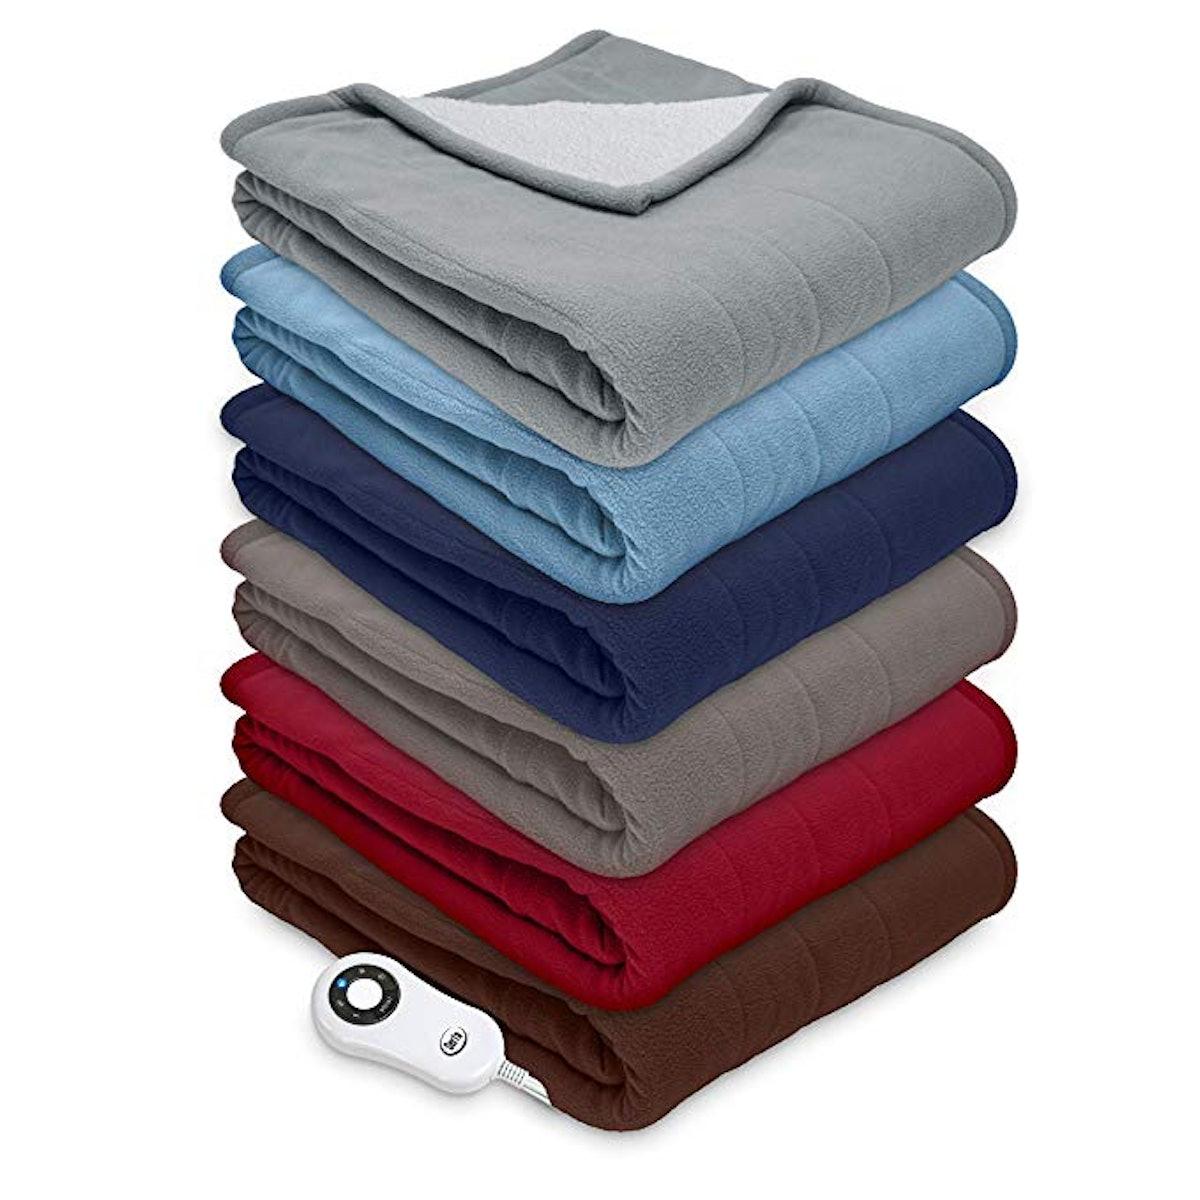 Serta Reversible Sherpa/Fleece Heated Electric Throw Blanket